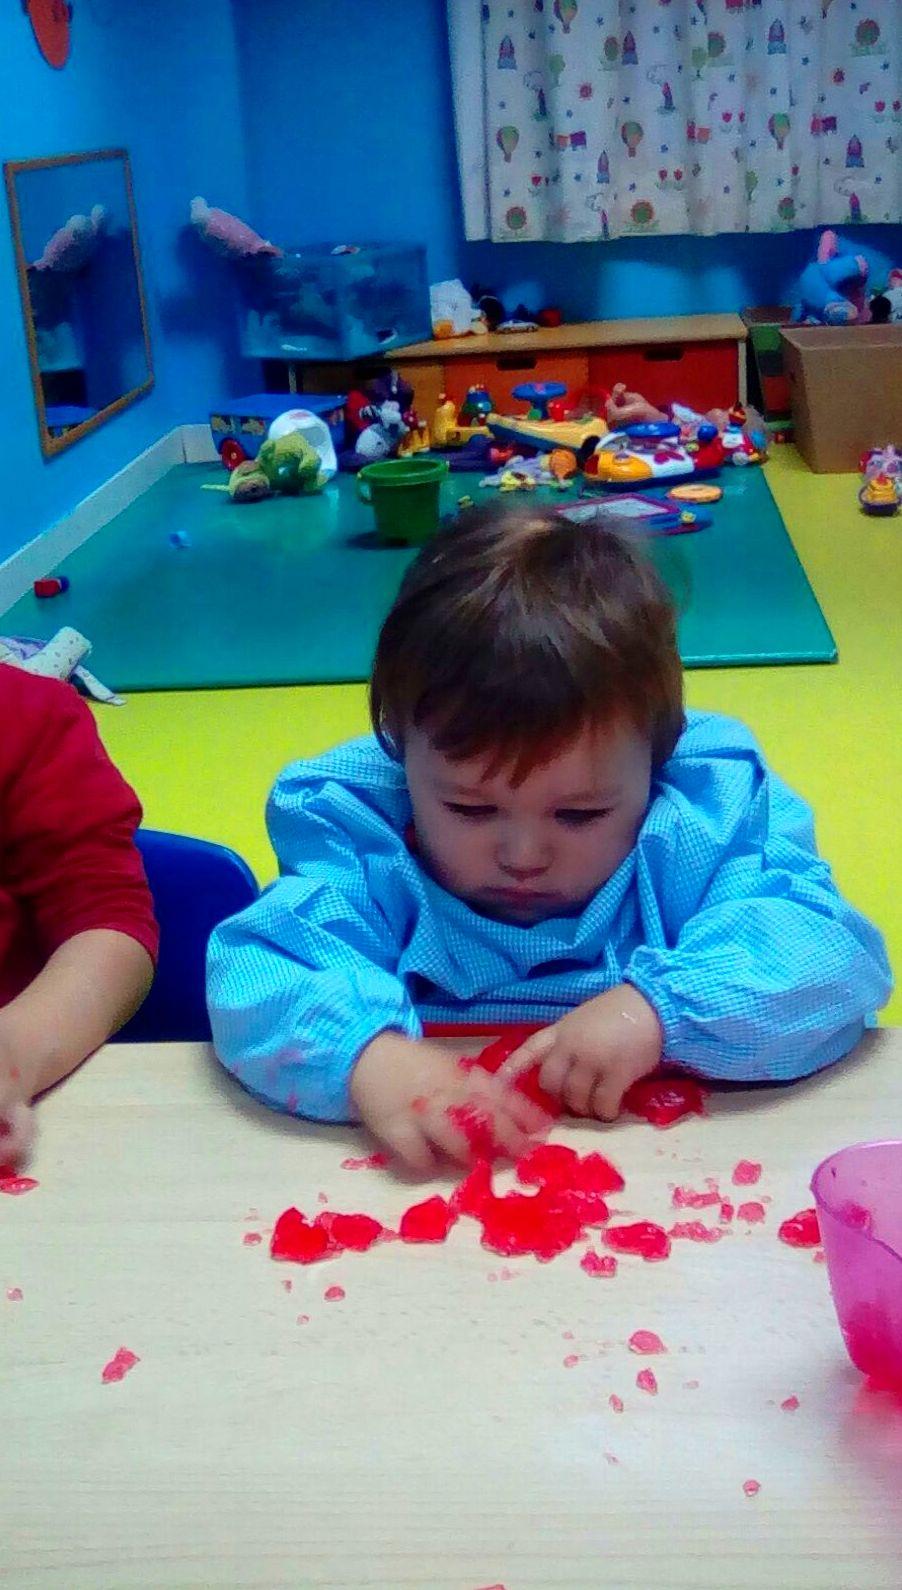 Foto 27 de Escuela infantil en Algete | E.I. Cuatro Pecas de Colores